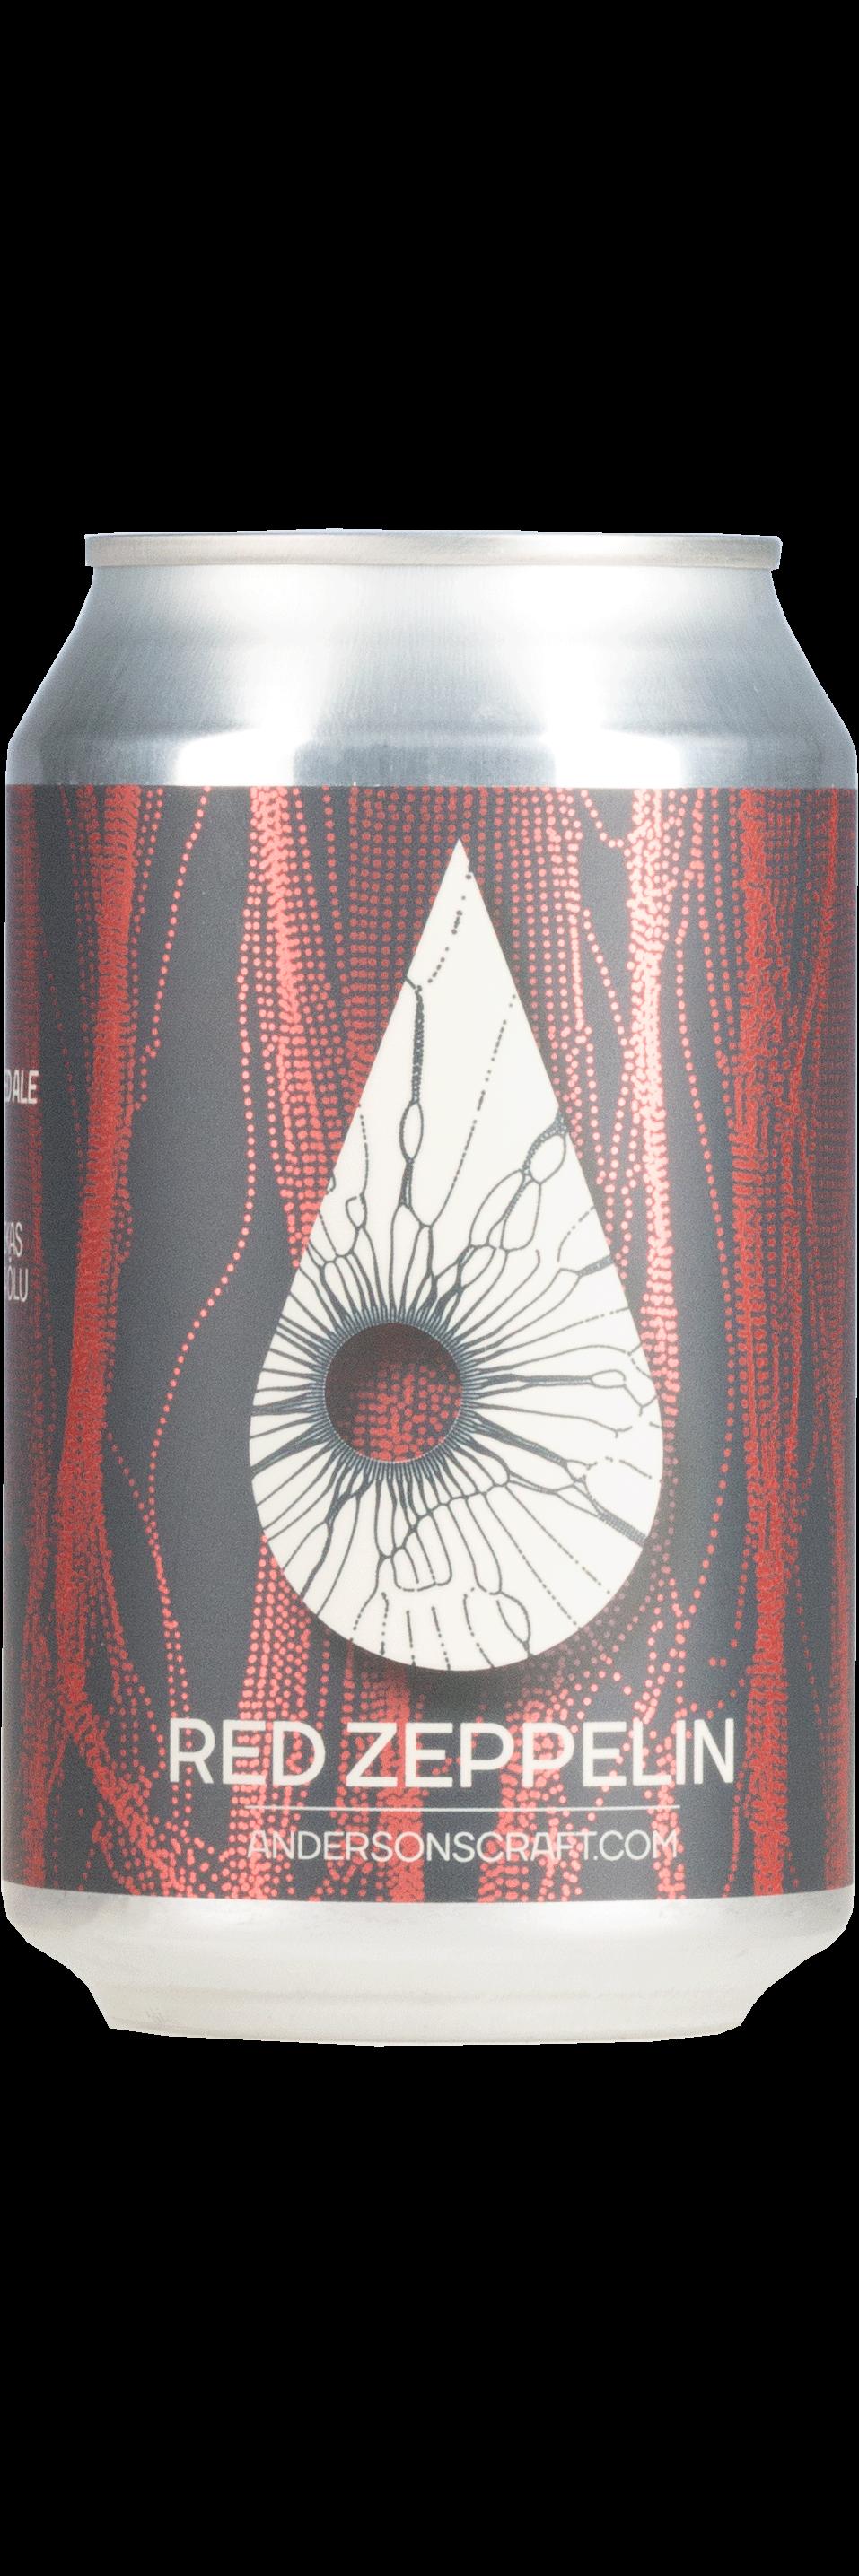 Anderson's Craft Red Zeppelin